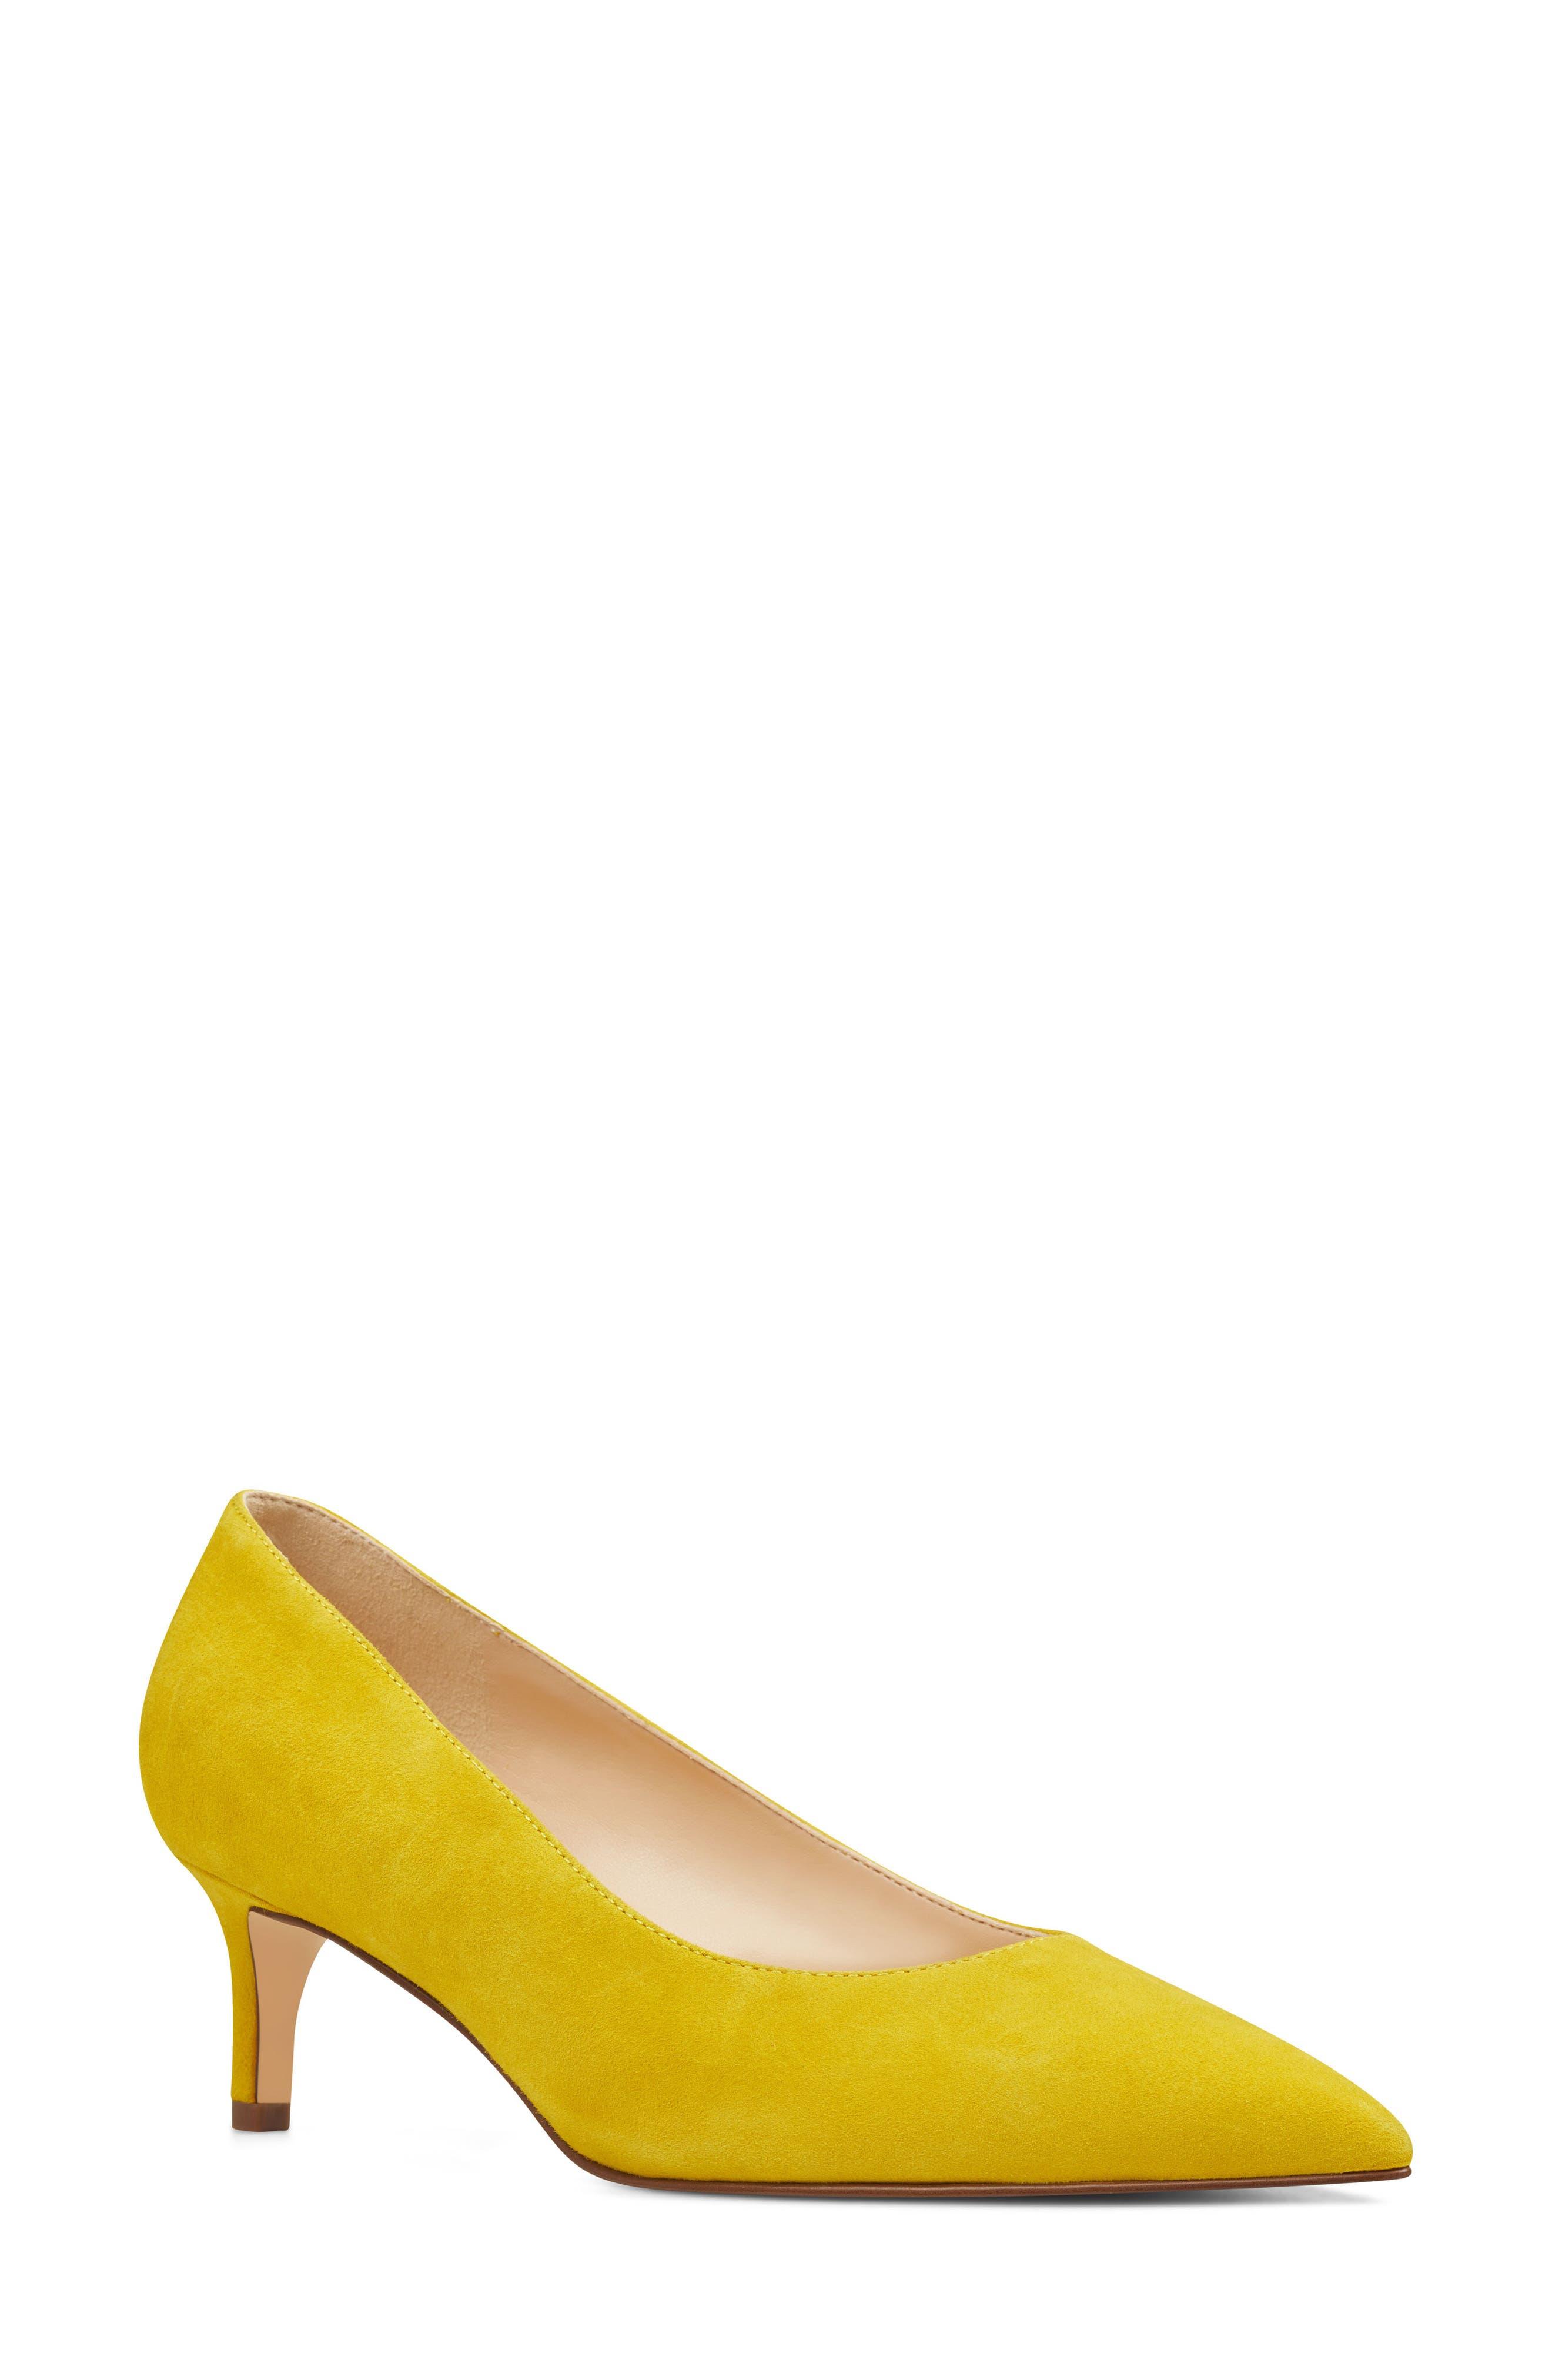 Nine West Fina Pump, Yellow